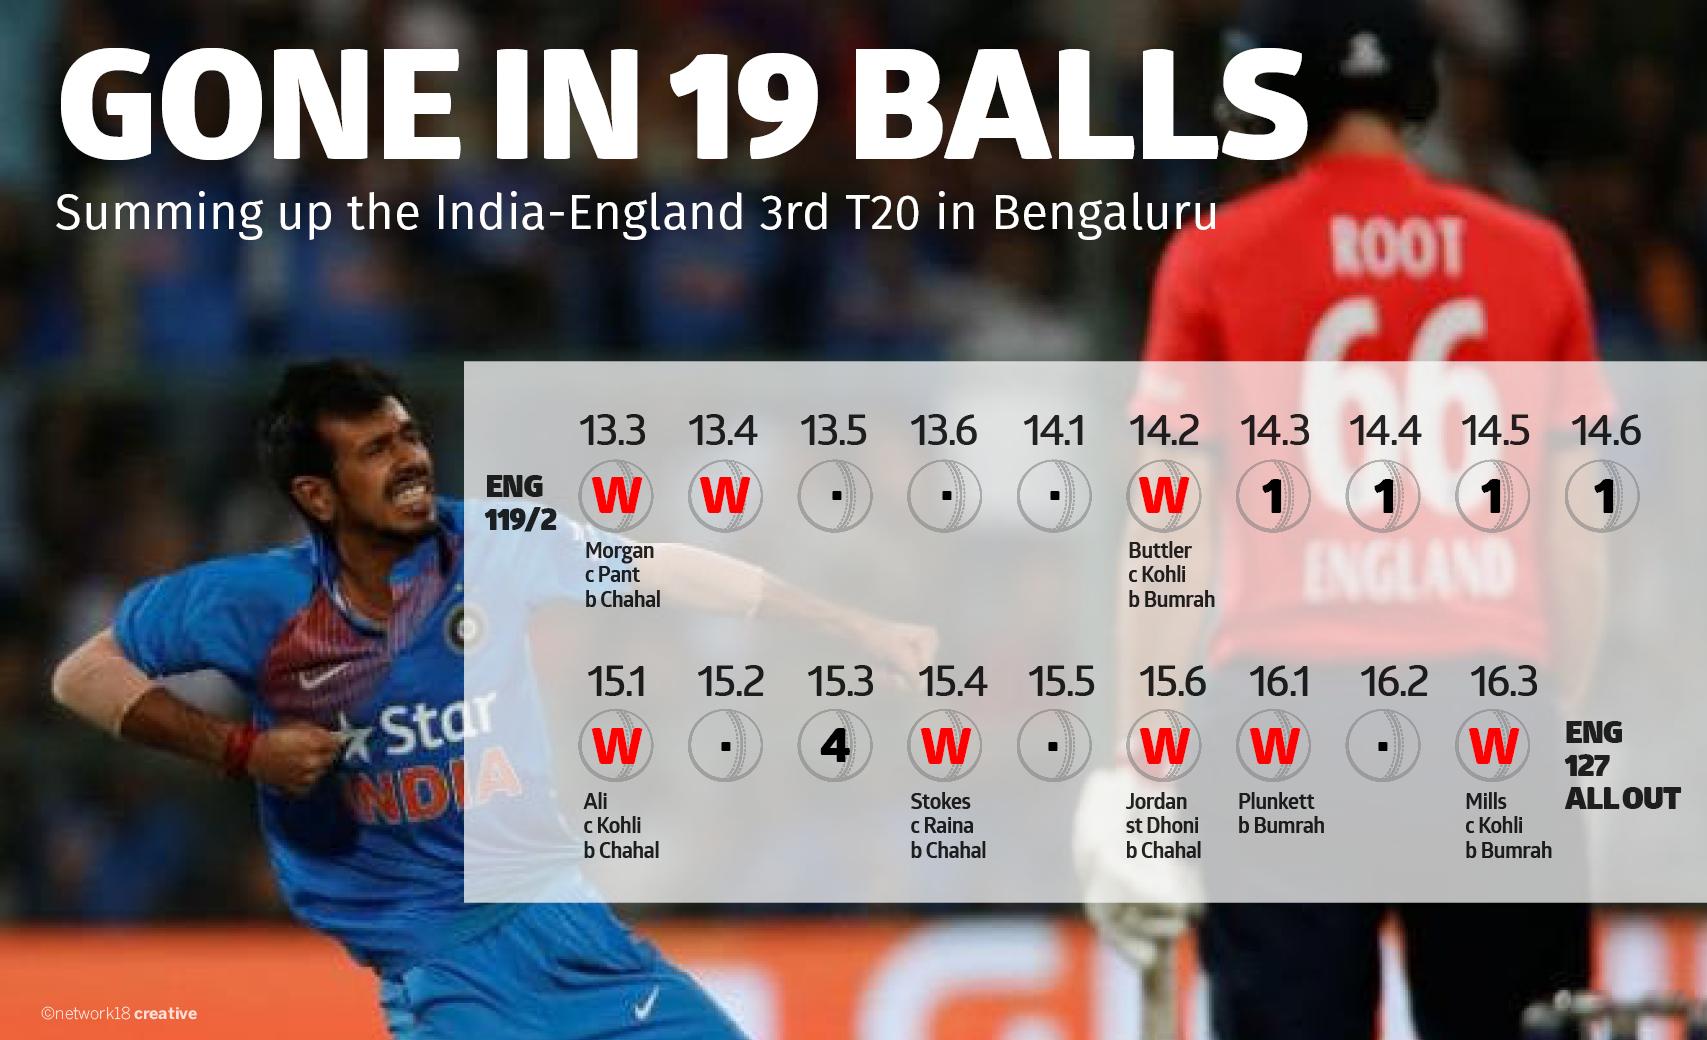 Gone in 19 balls